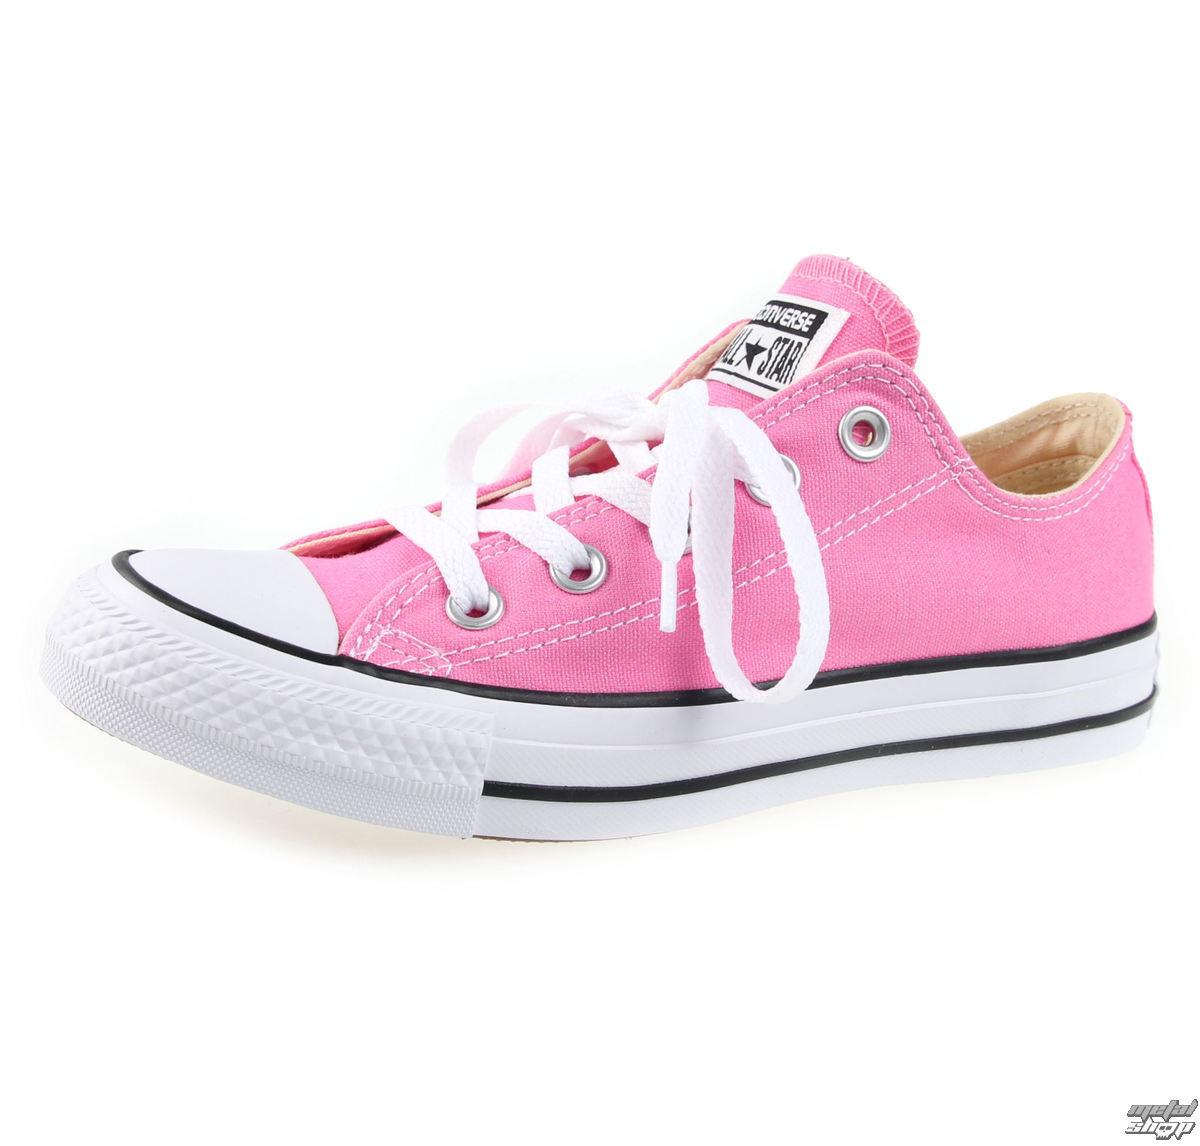 rövidszárú cipő női - CONVERSE - M9007 - Metalshop.hu ca6e217cd4